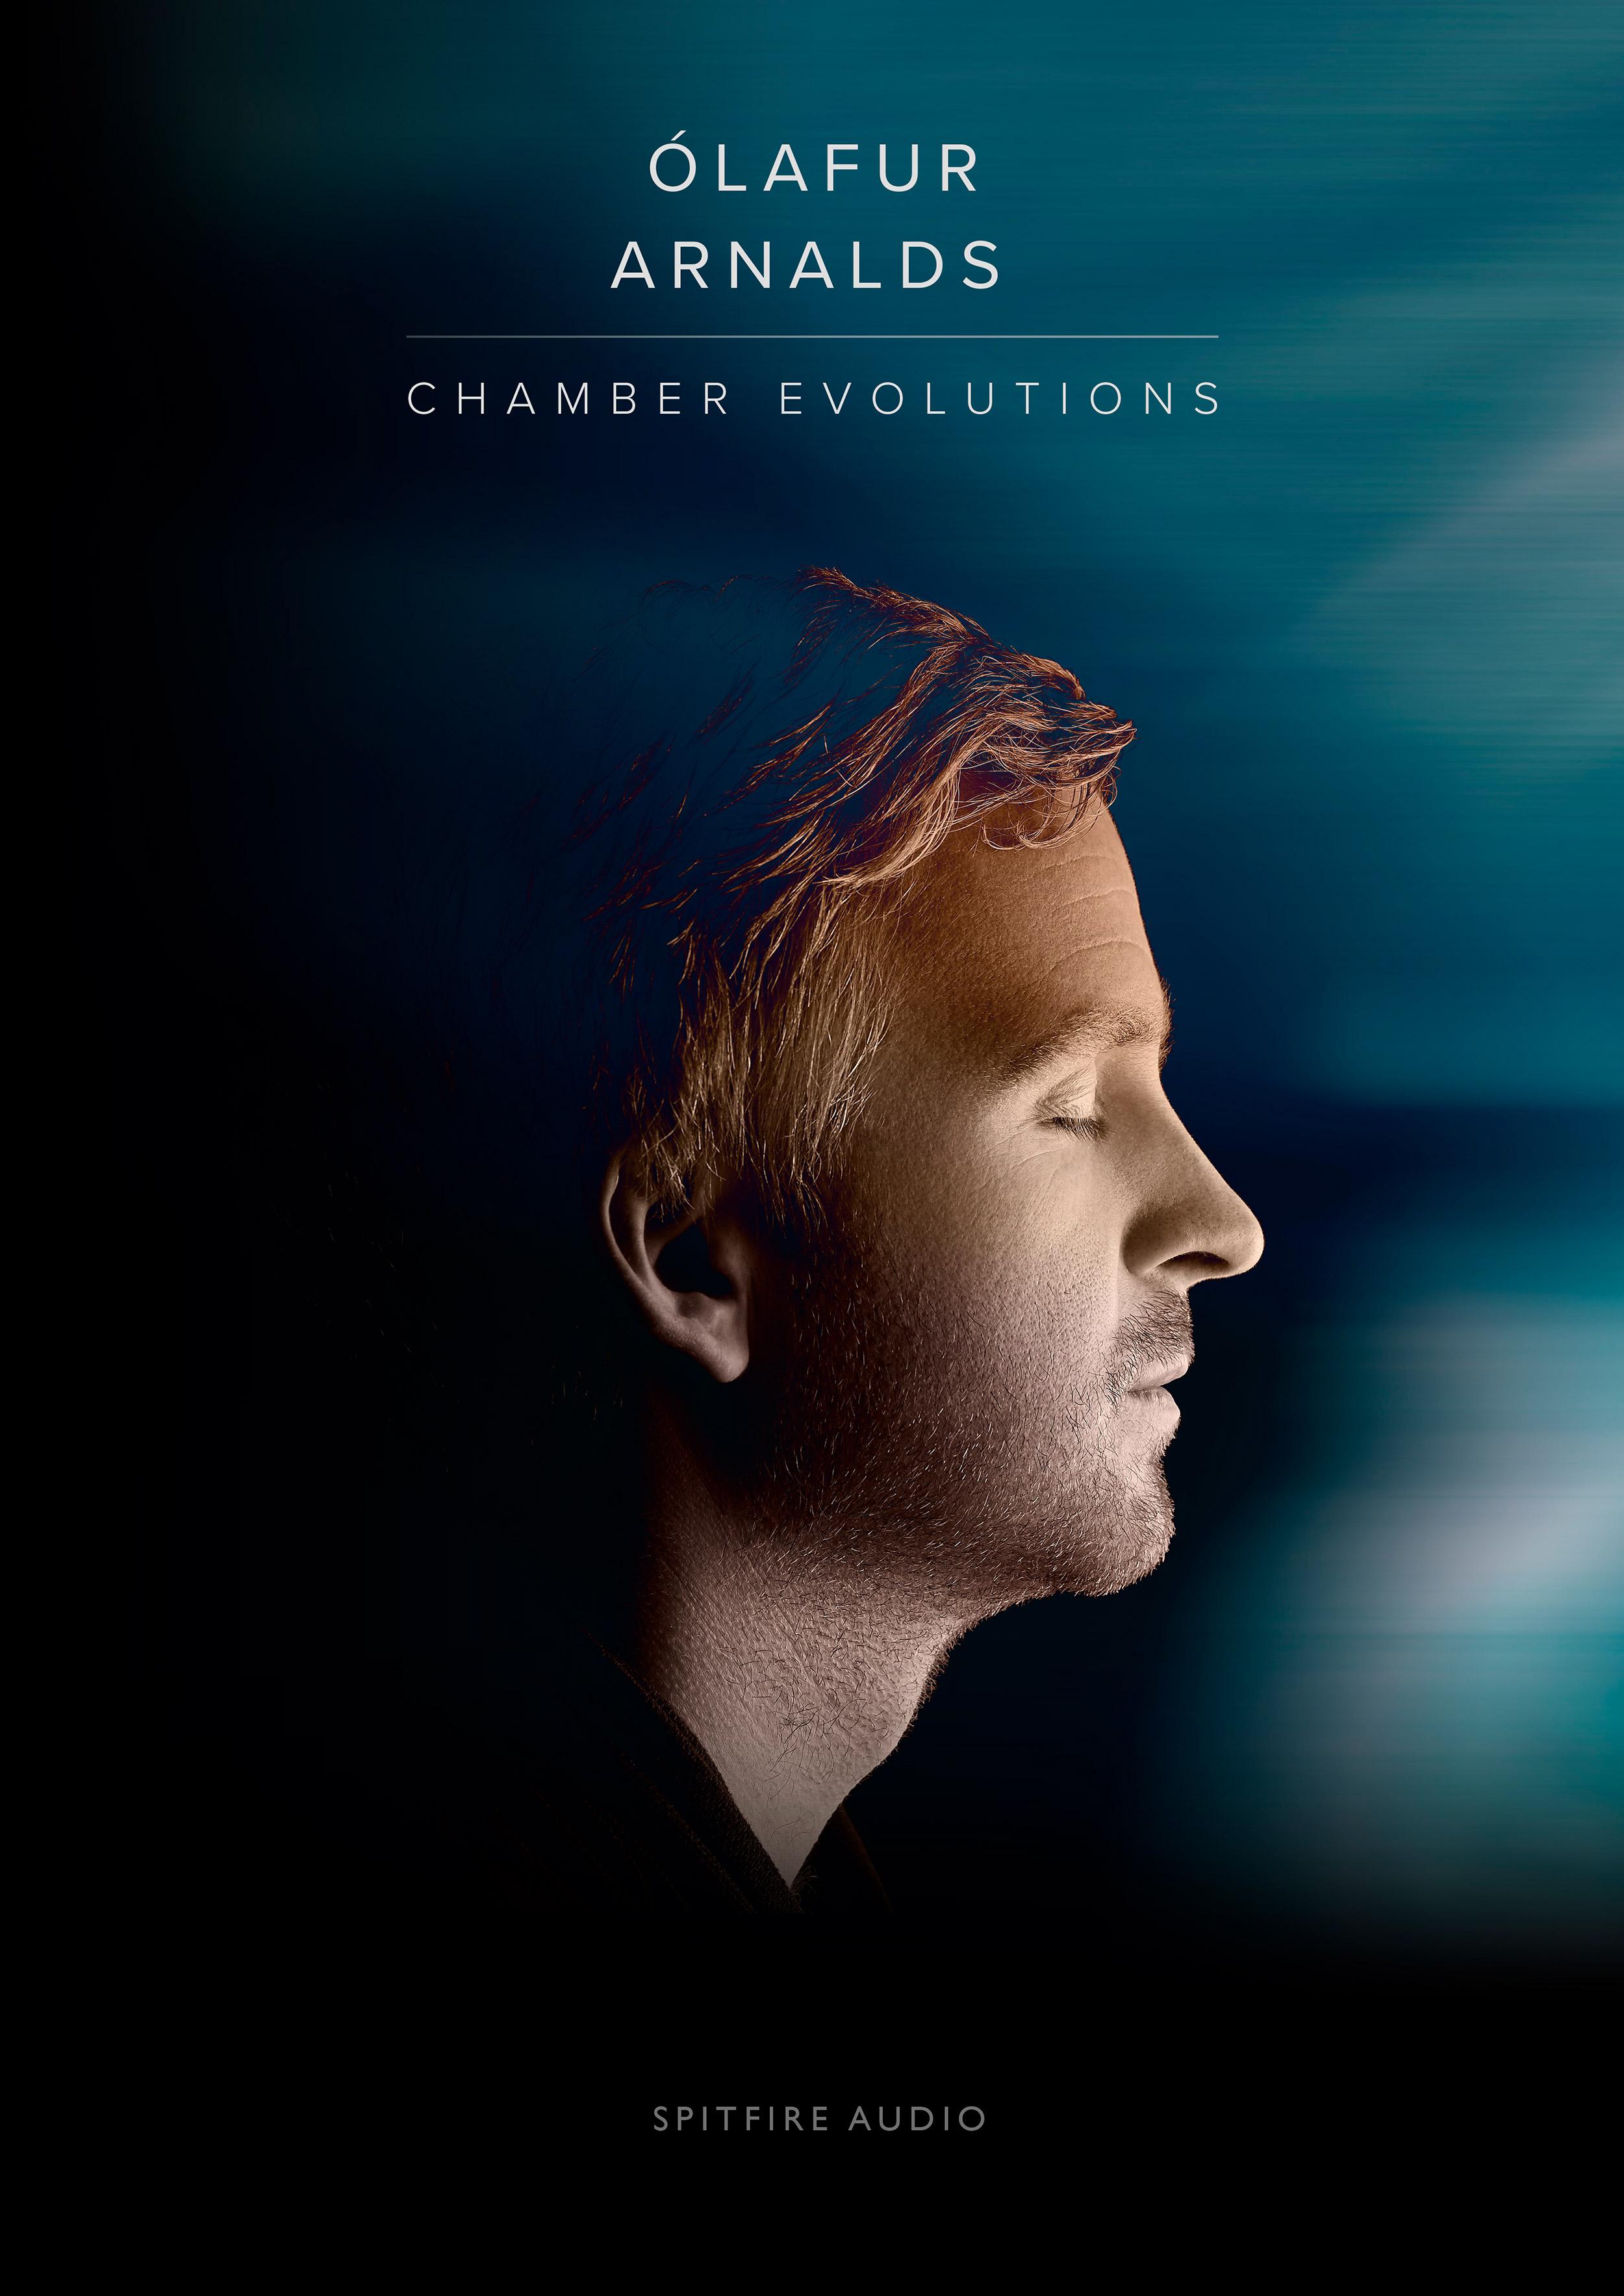 Ólafur Arnalds - Chamber Evolutions SPITFIRE AUDIO  8 Images